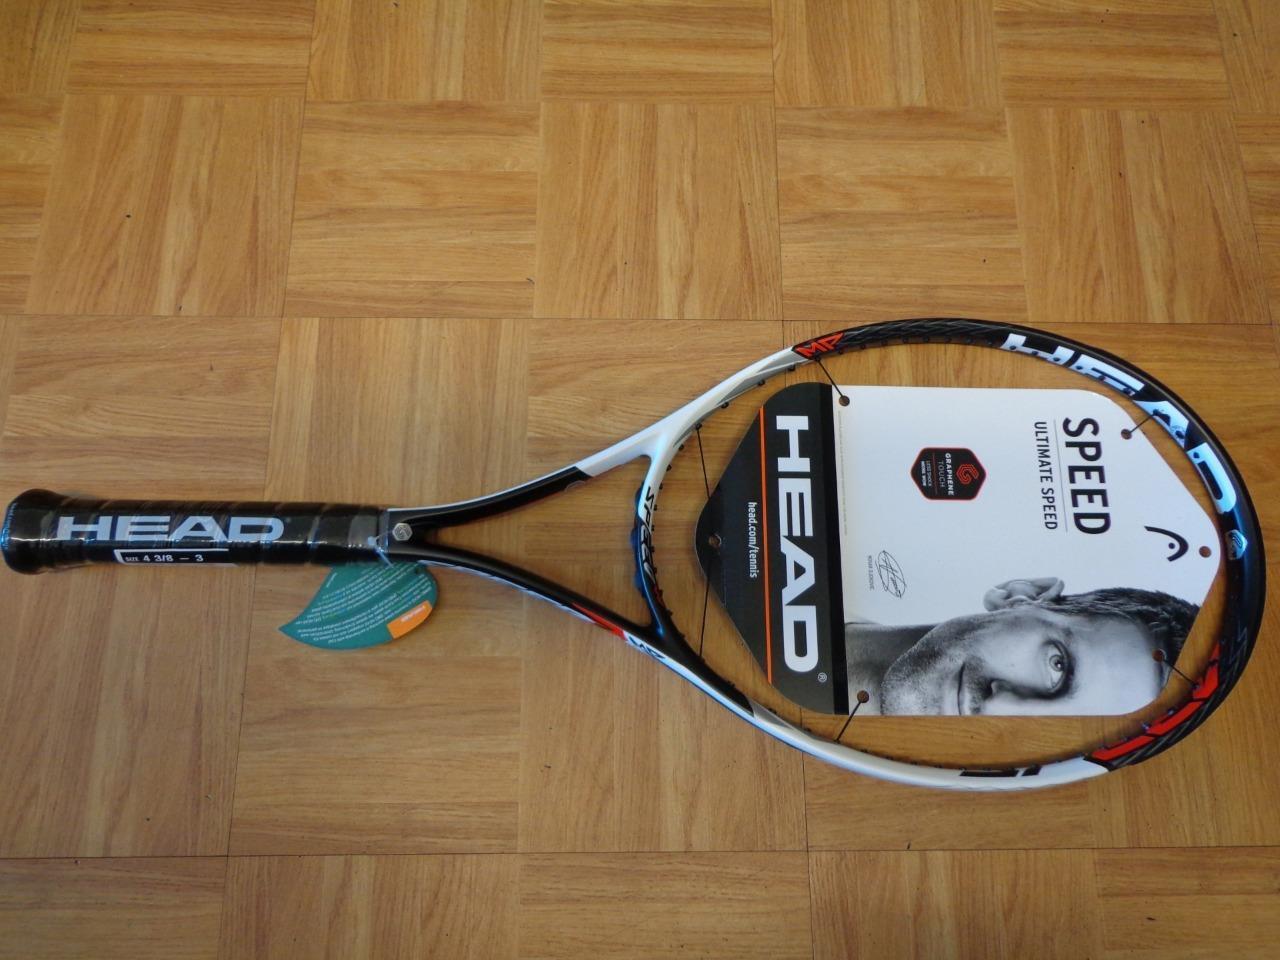 NEW 2016 Head Graphene Touch Speed MP 100 head 4 3 8 grip Tennis Racquet